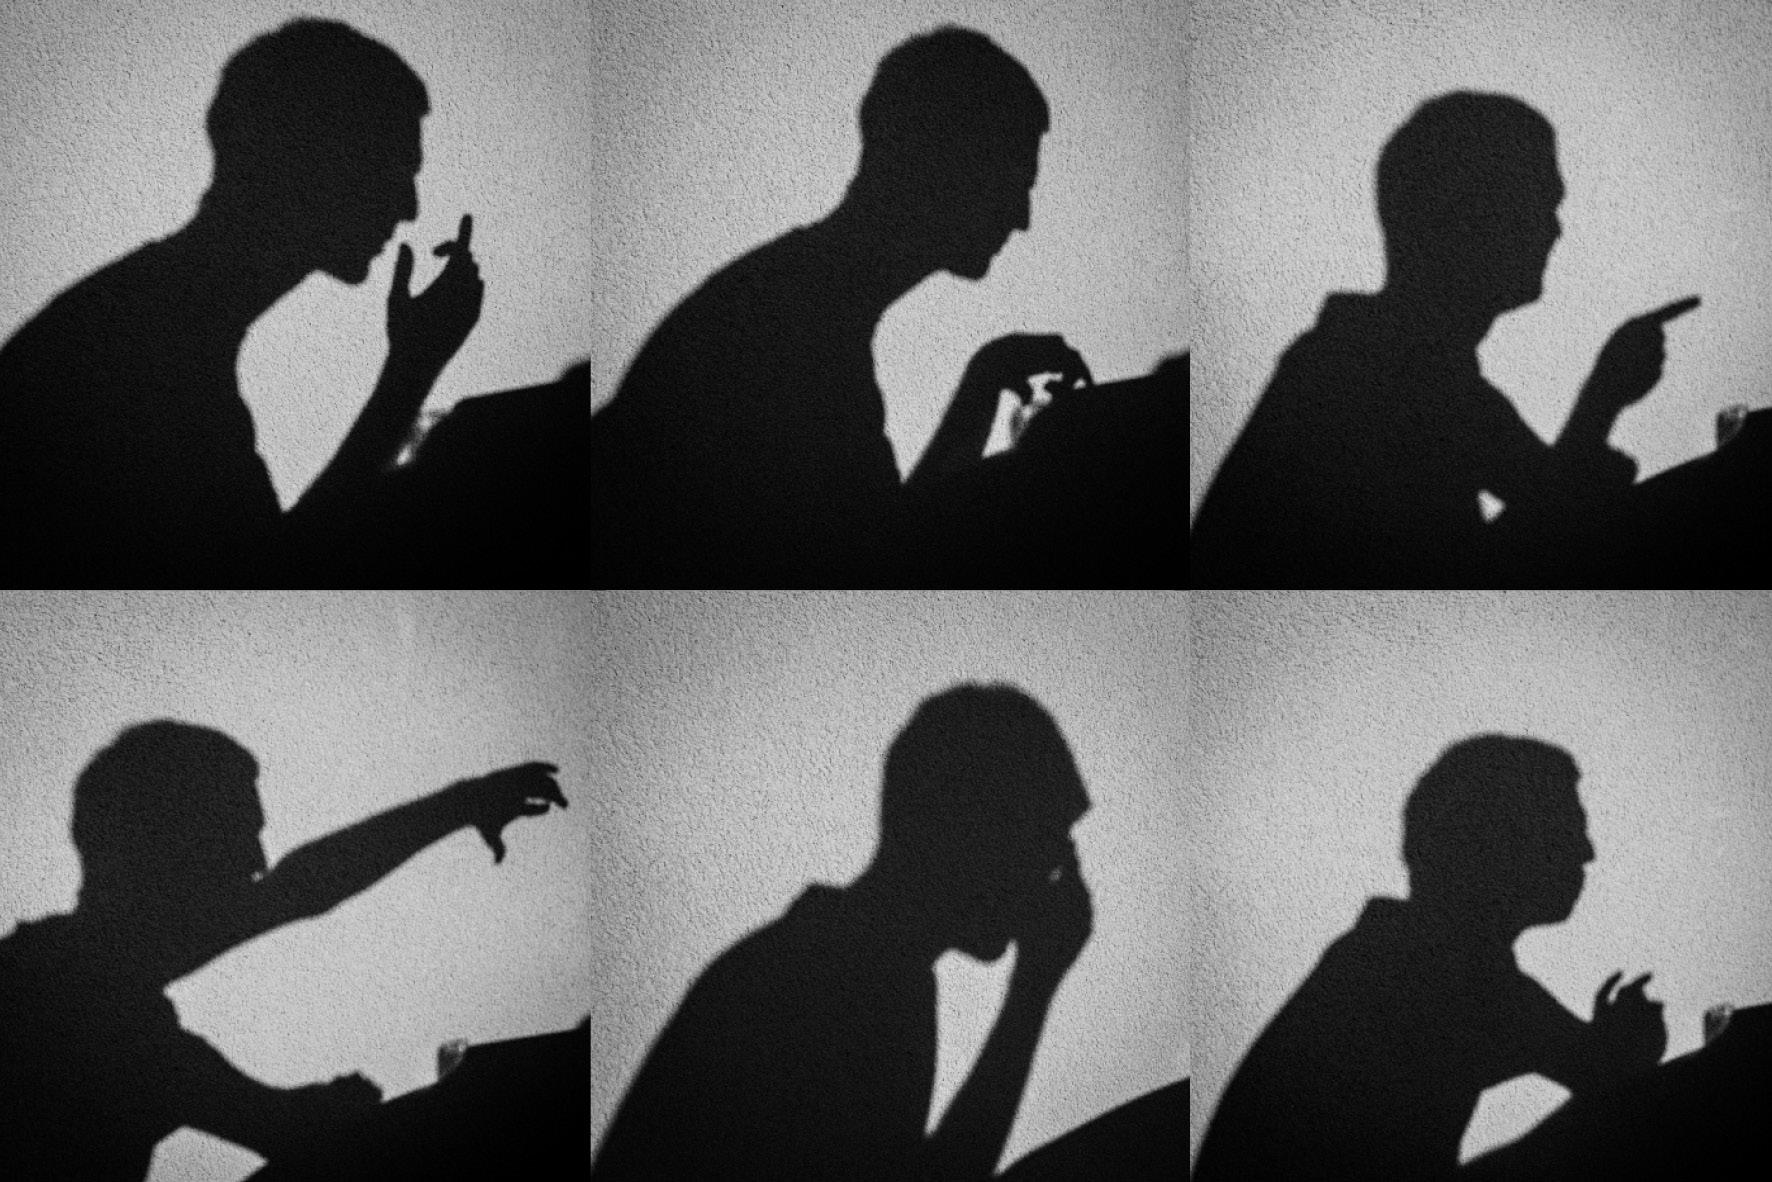 Photographier les ombres